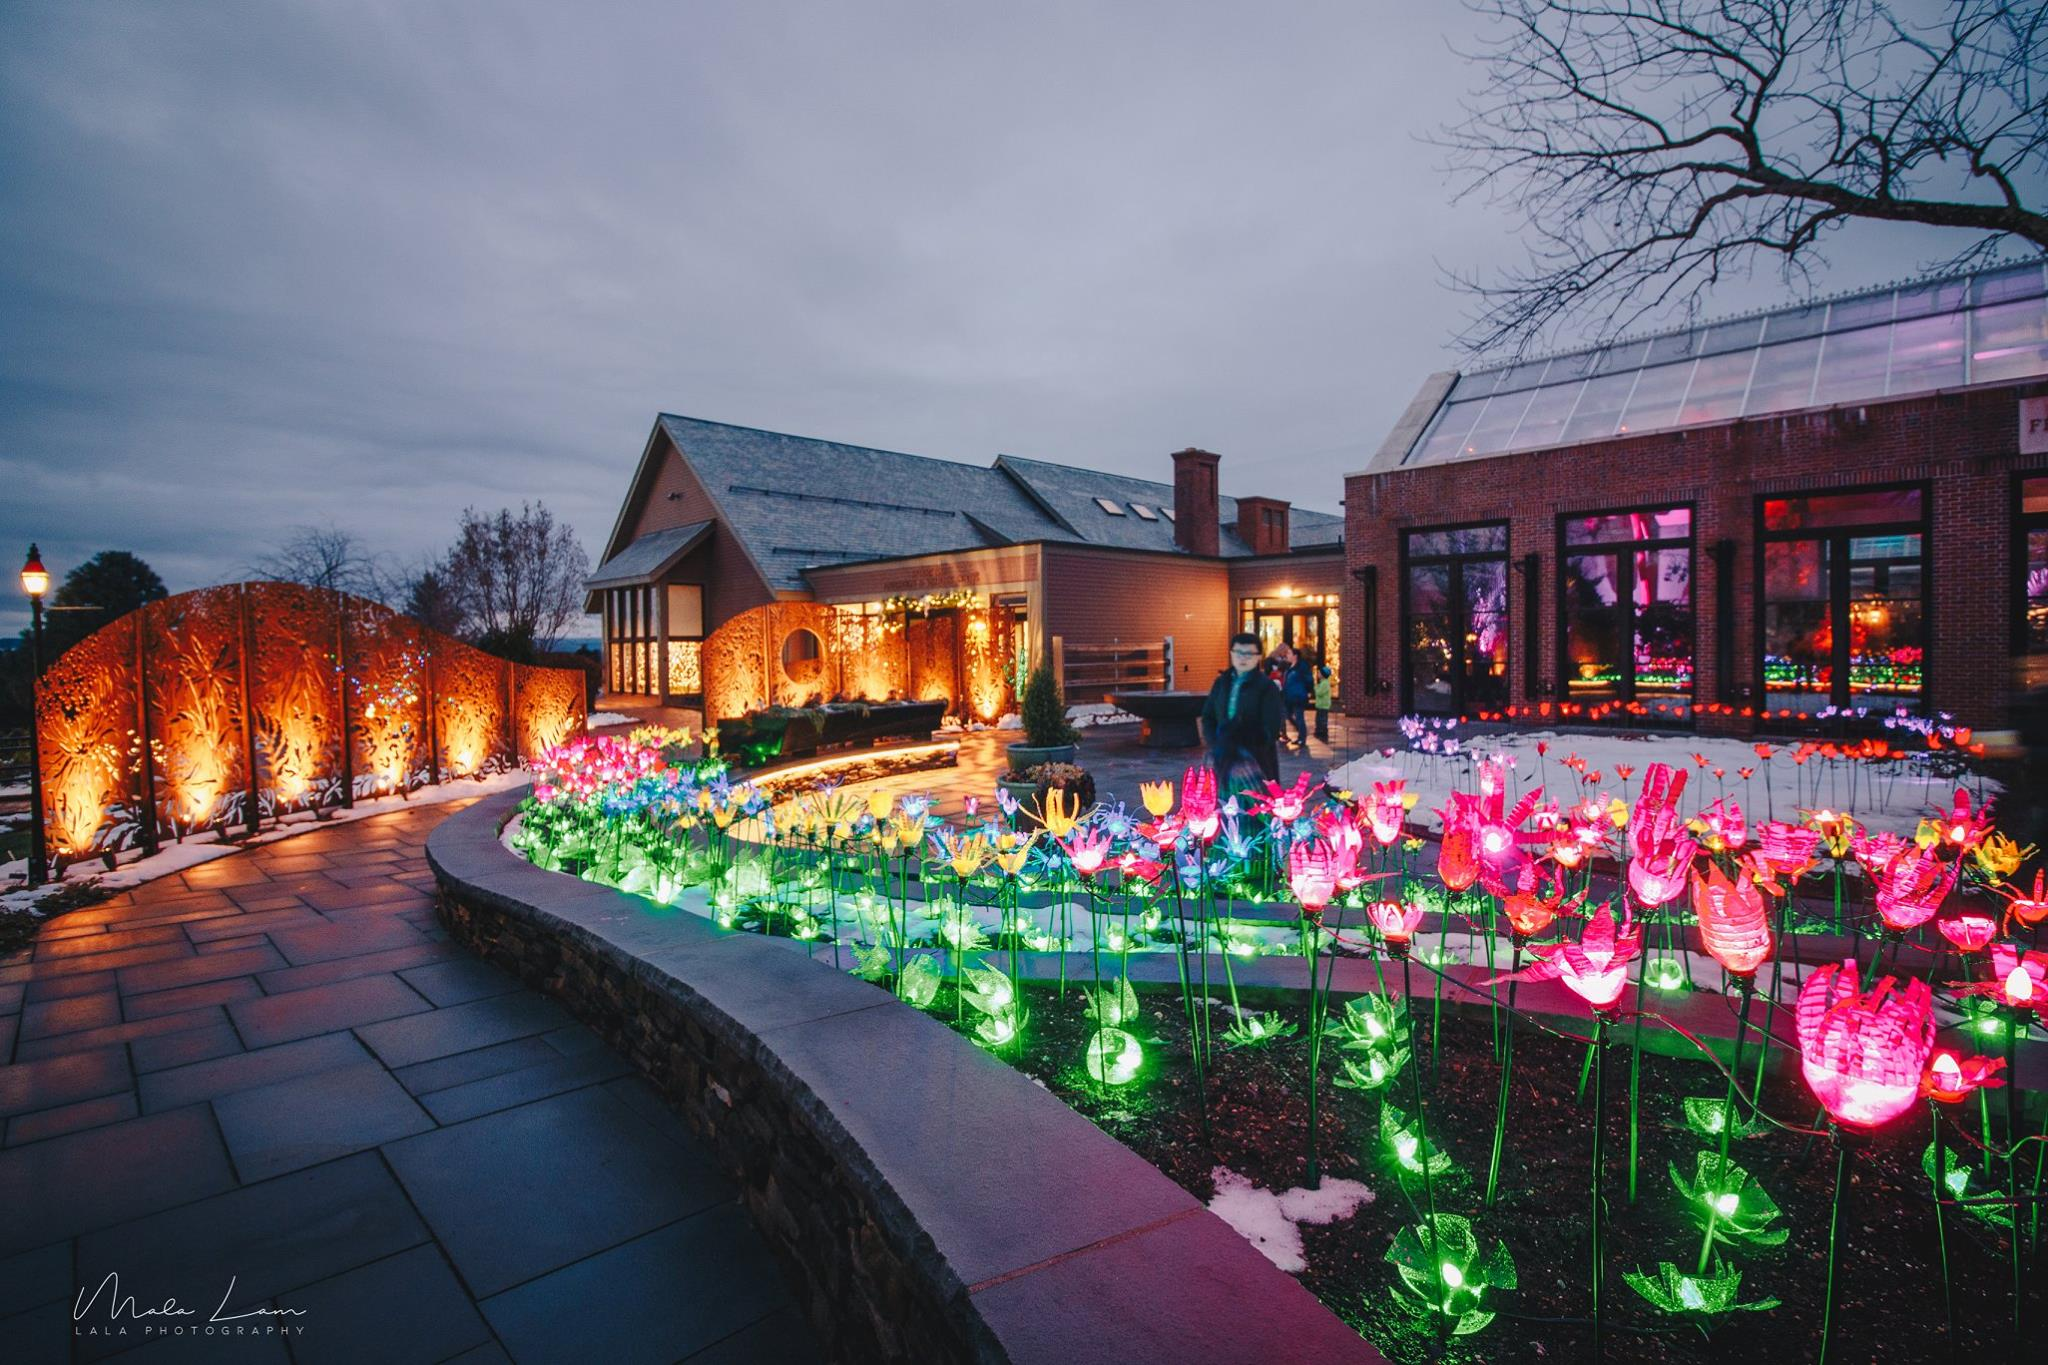 night lights at tower hill botanic garden